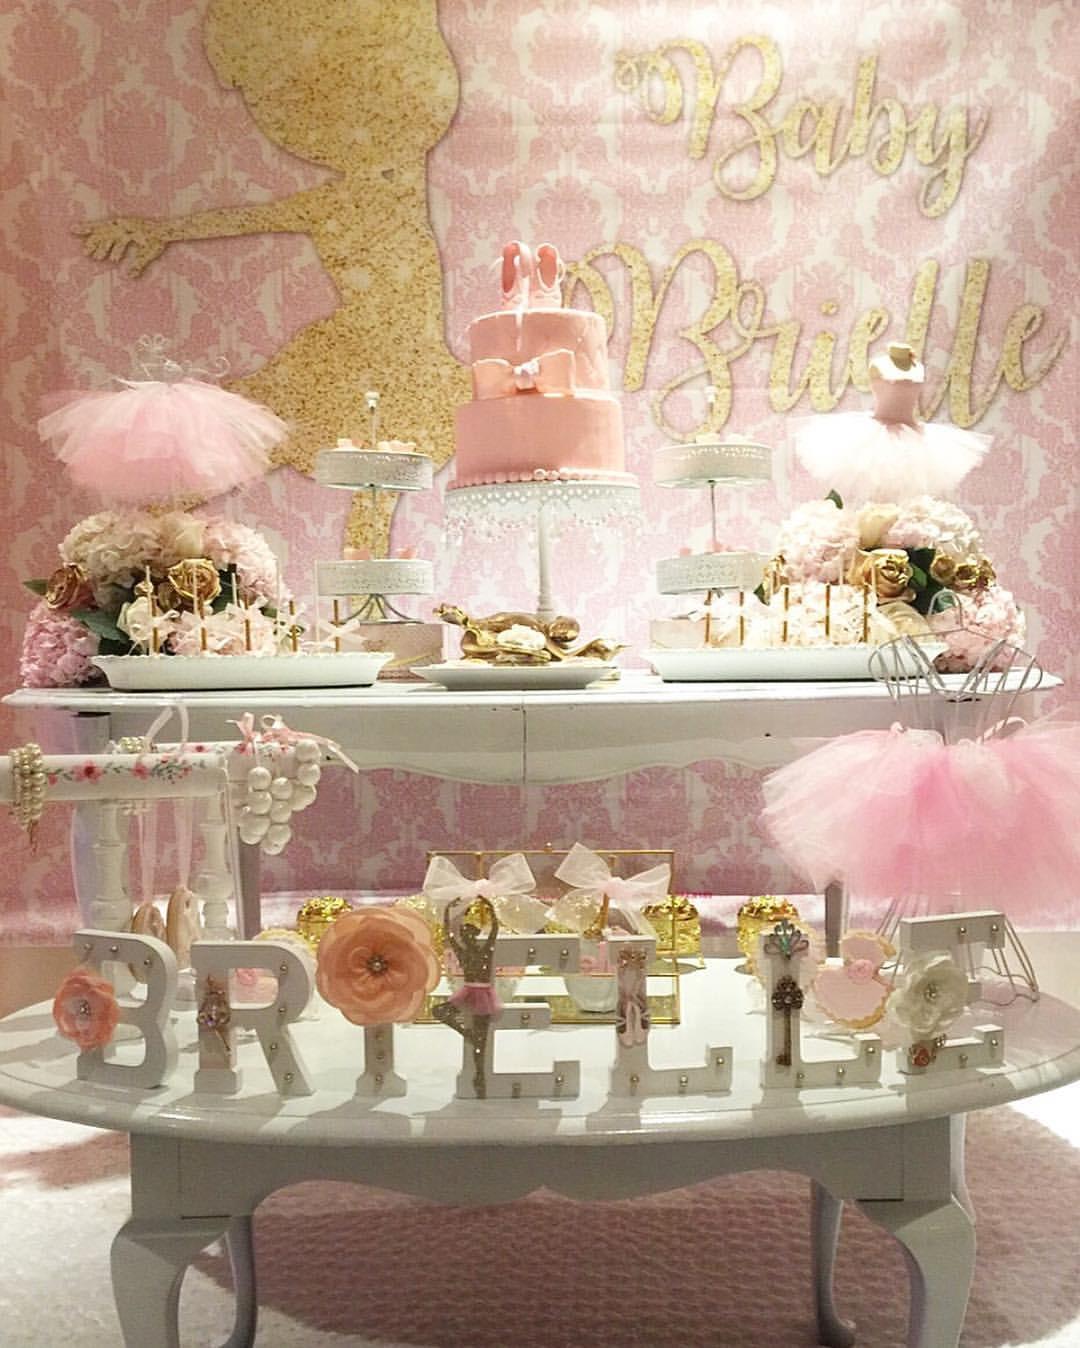 white-chandelier-cake-stand-opulent-treasures-mylittle-angel-decor.JPG